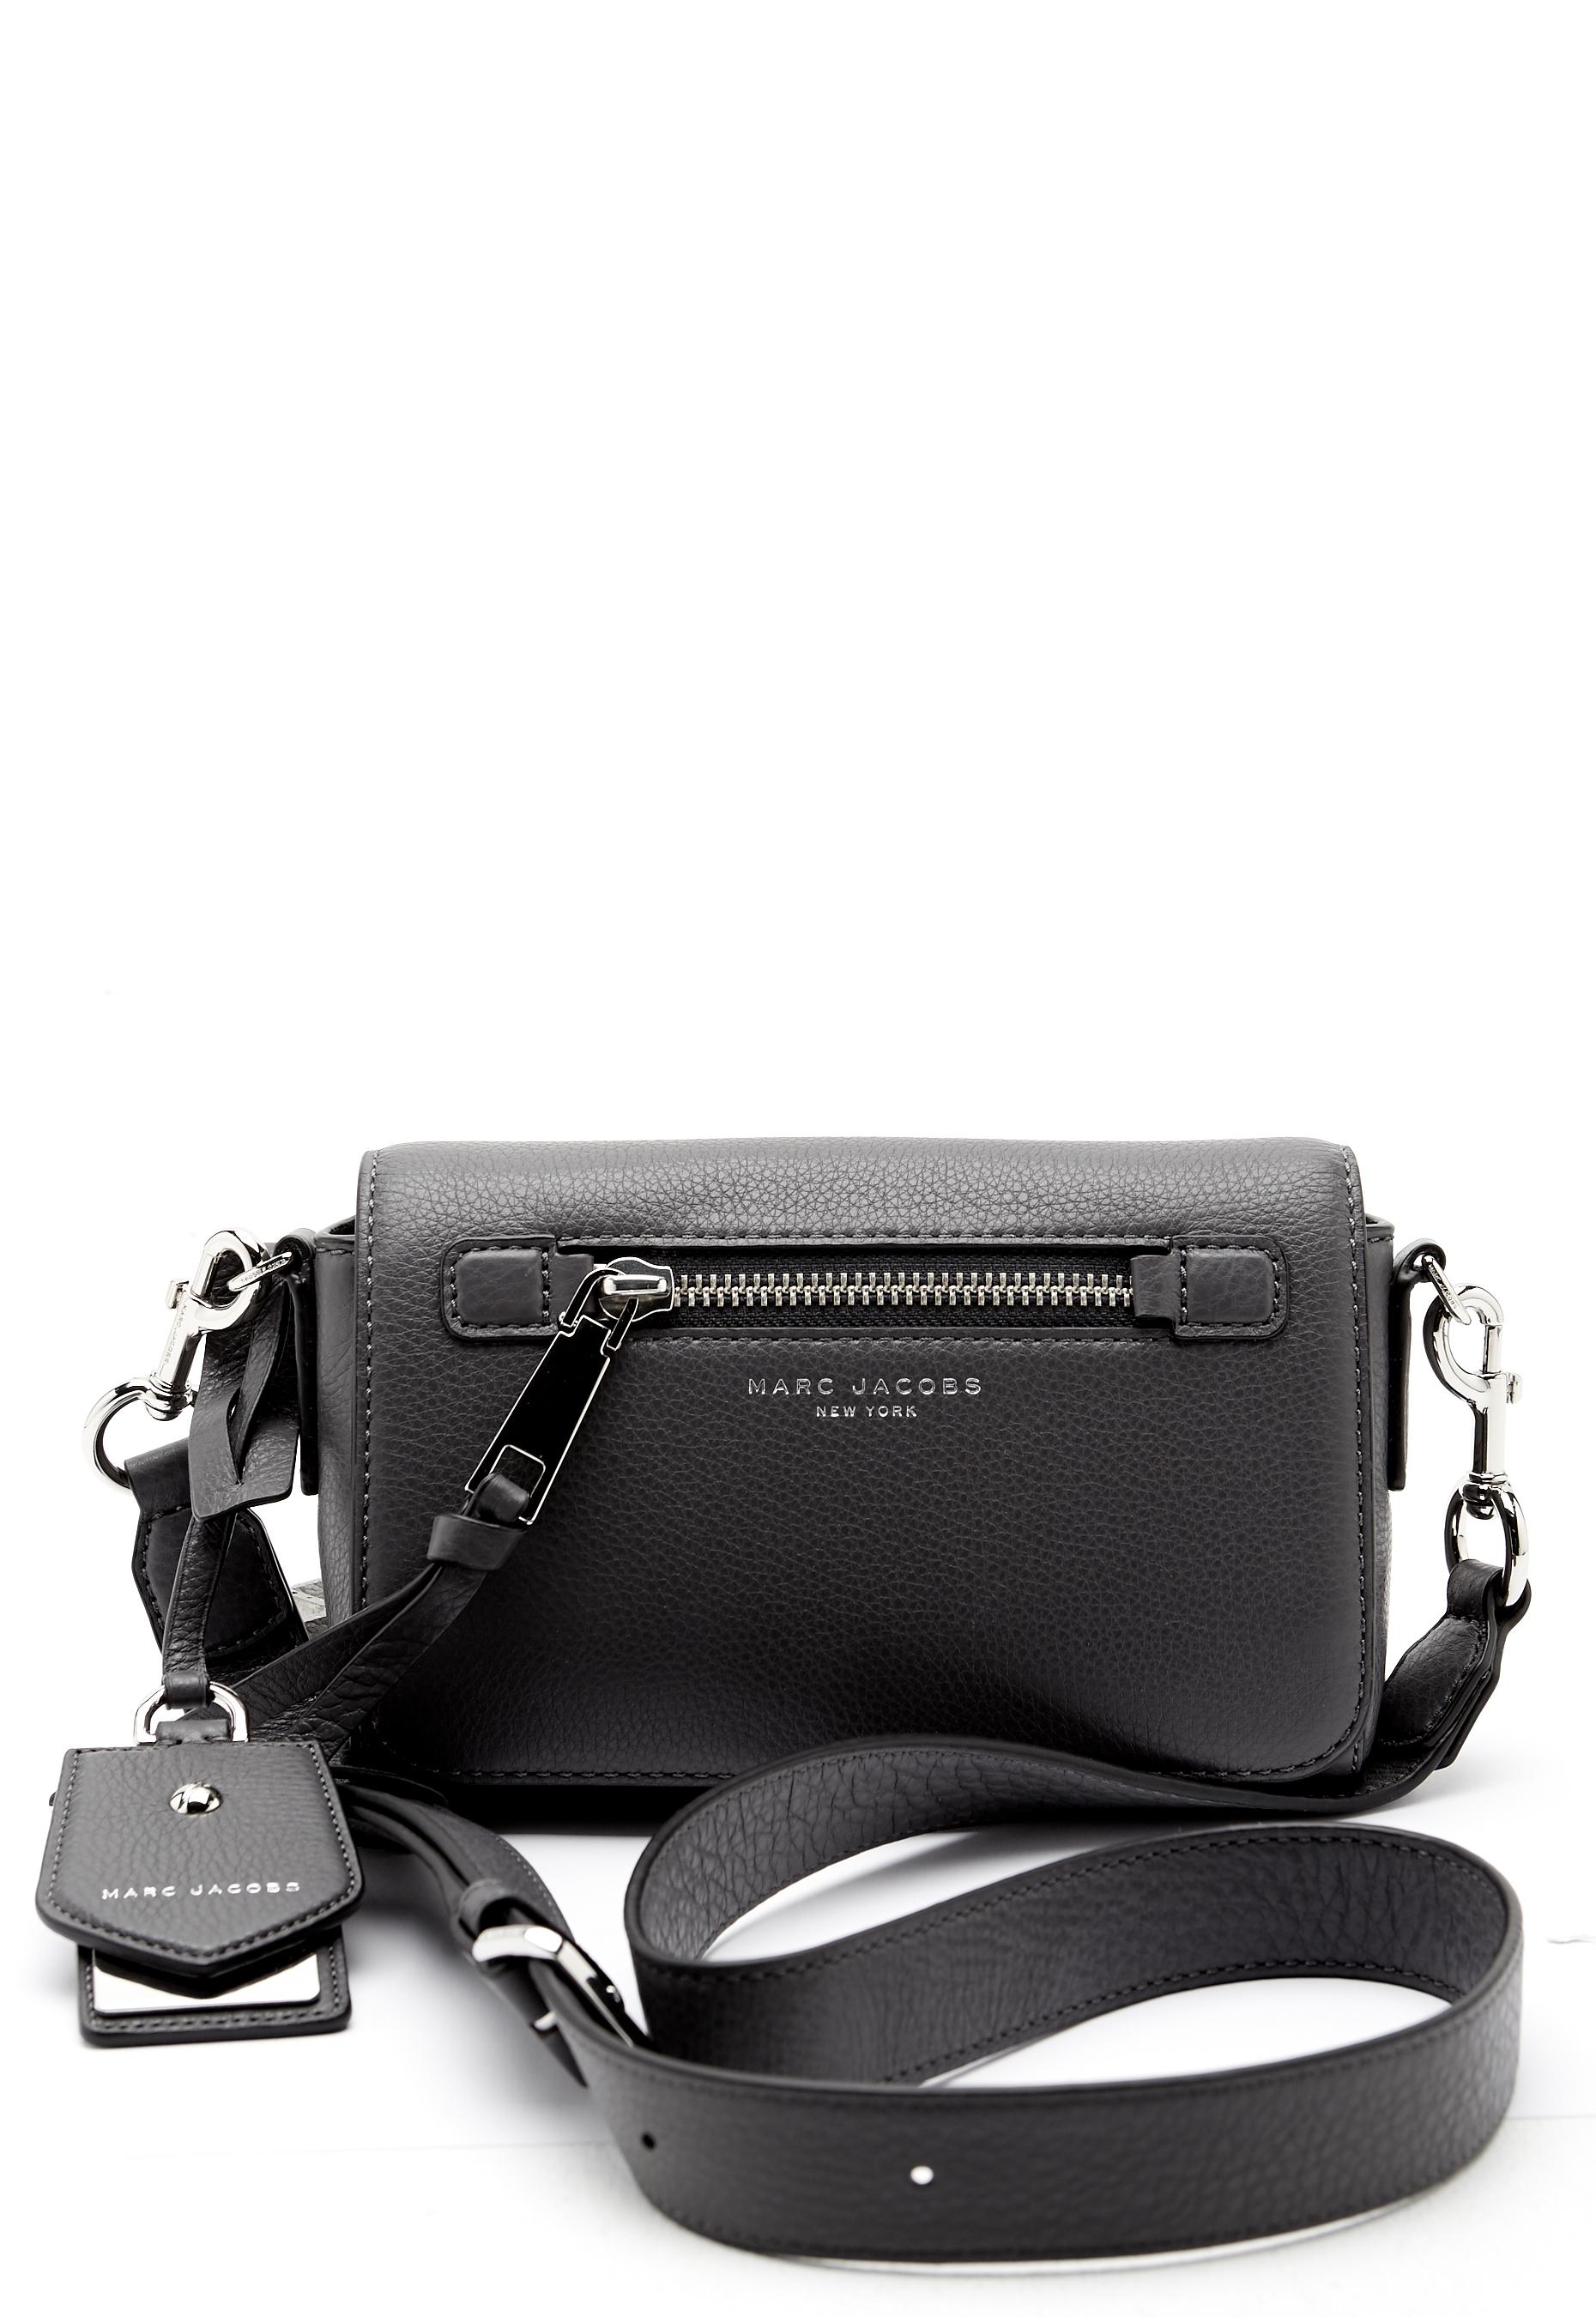 3fcbaa0b5cbf Marc Jacobs Recruit Crossbody Bag Shadow - Bubbleroom